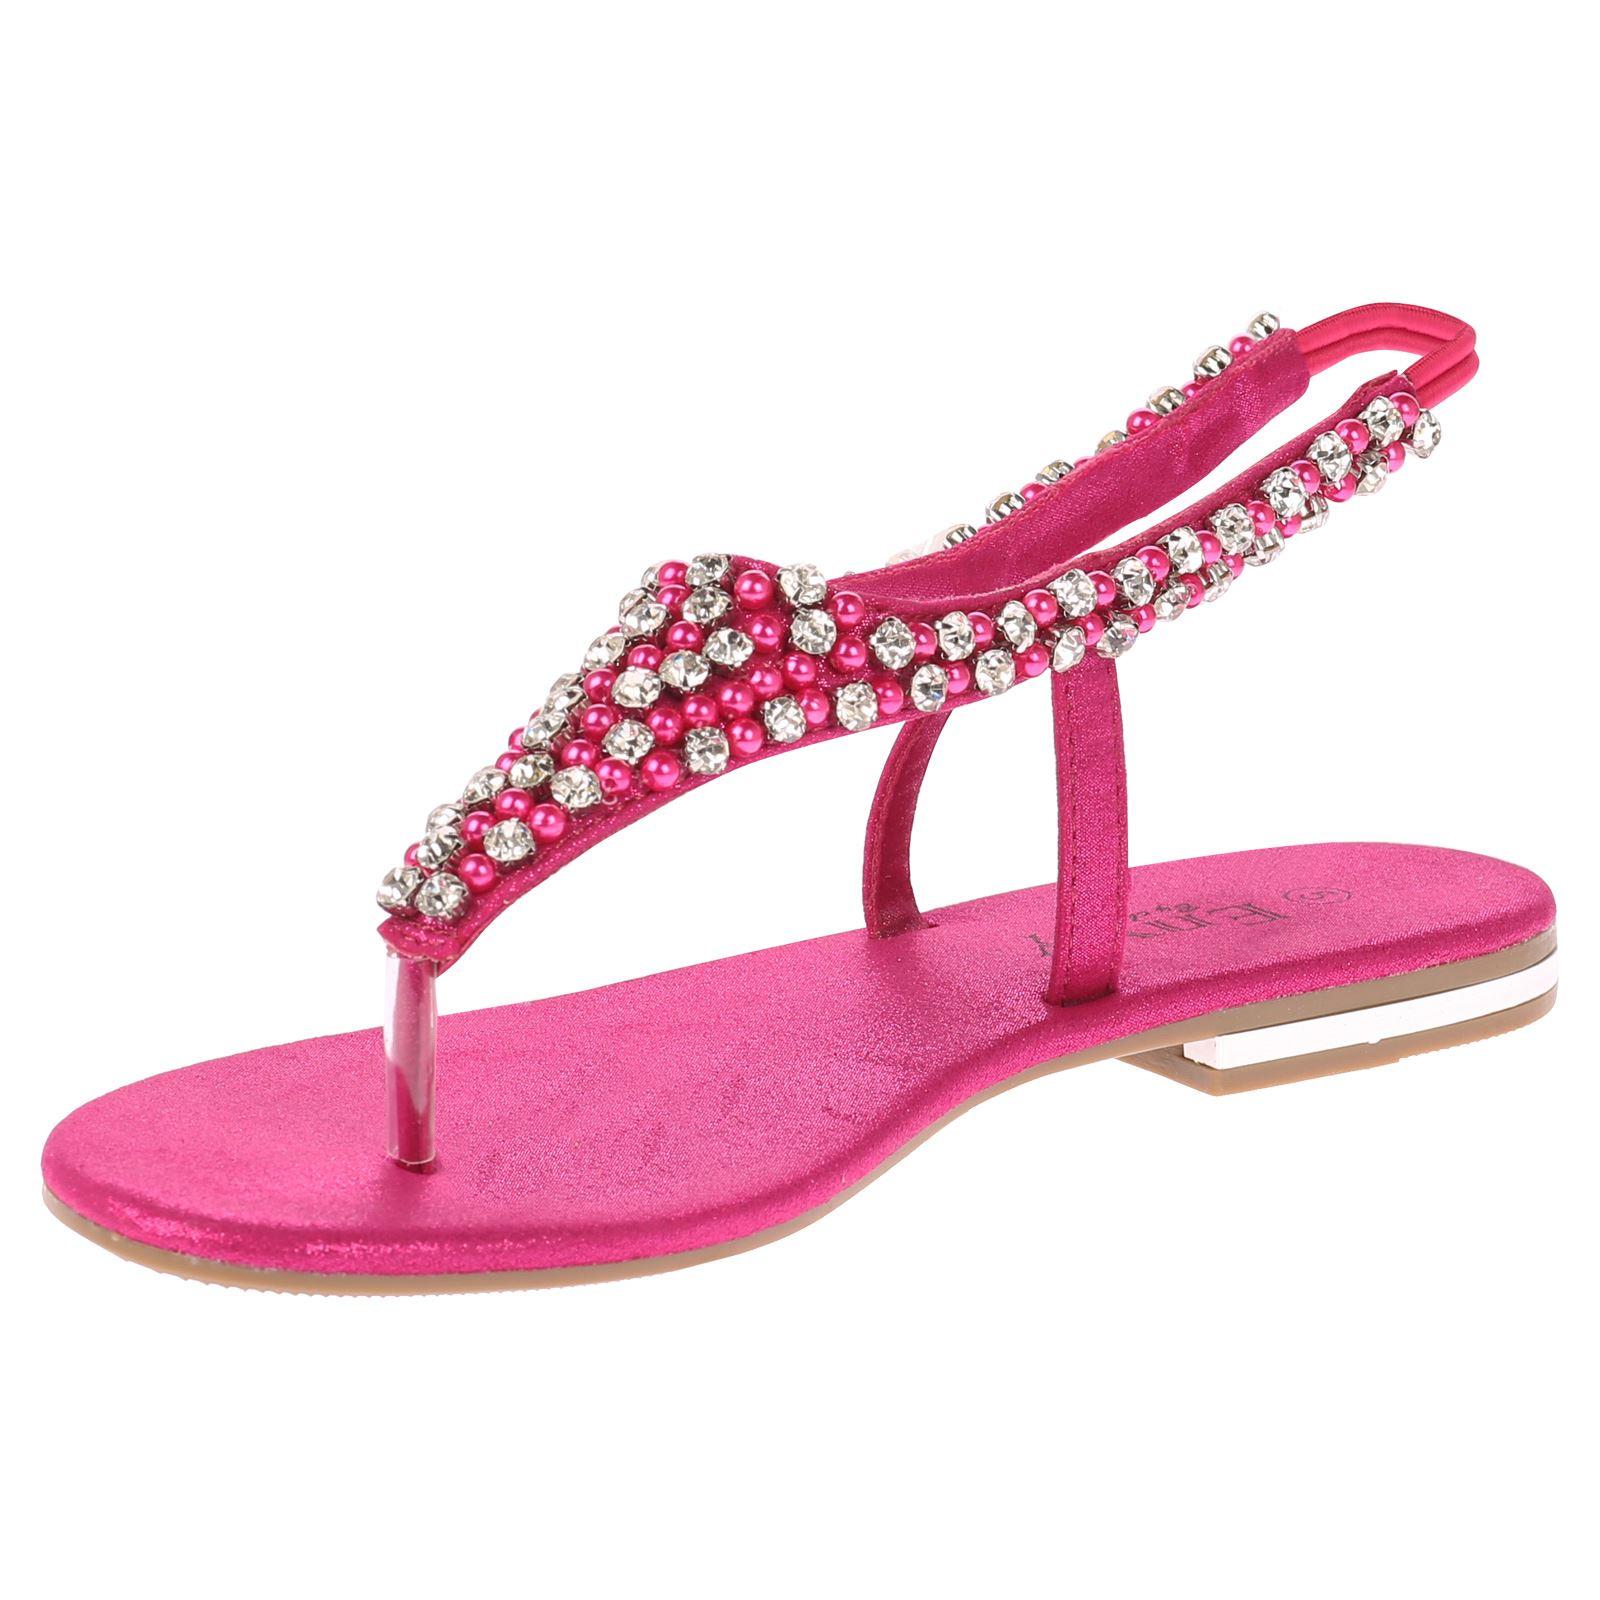 Linda Womens Flats Diamante Low Heels Evening Dress Formal ...